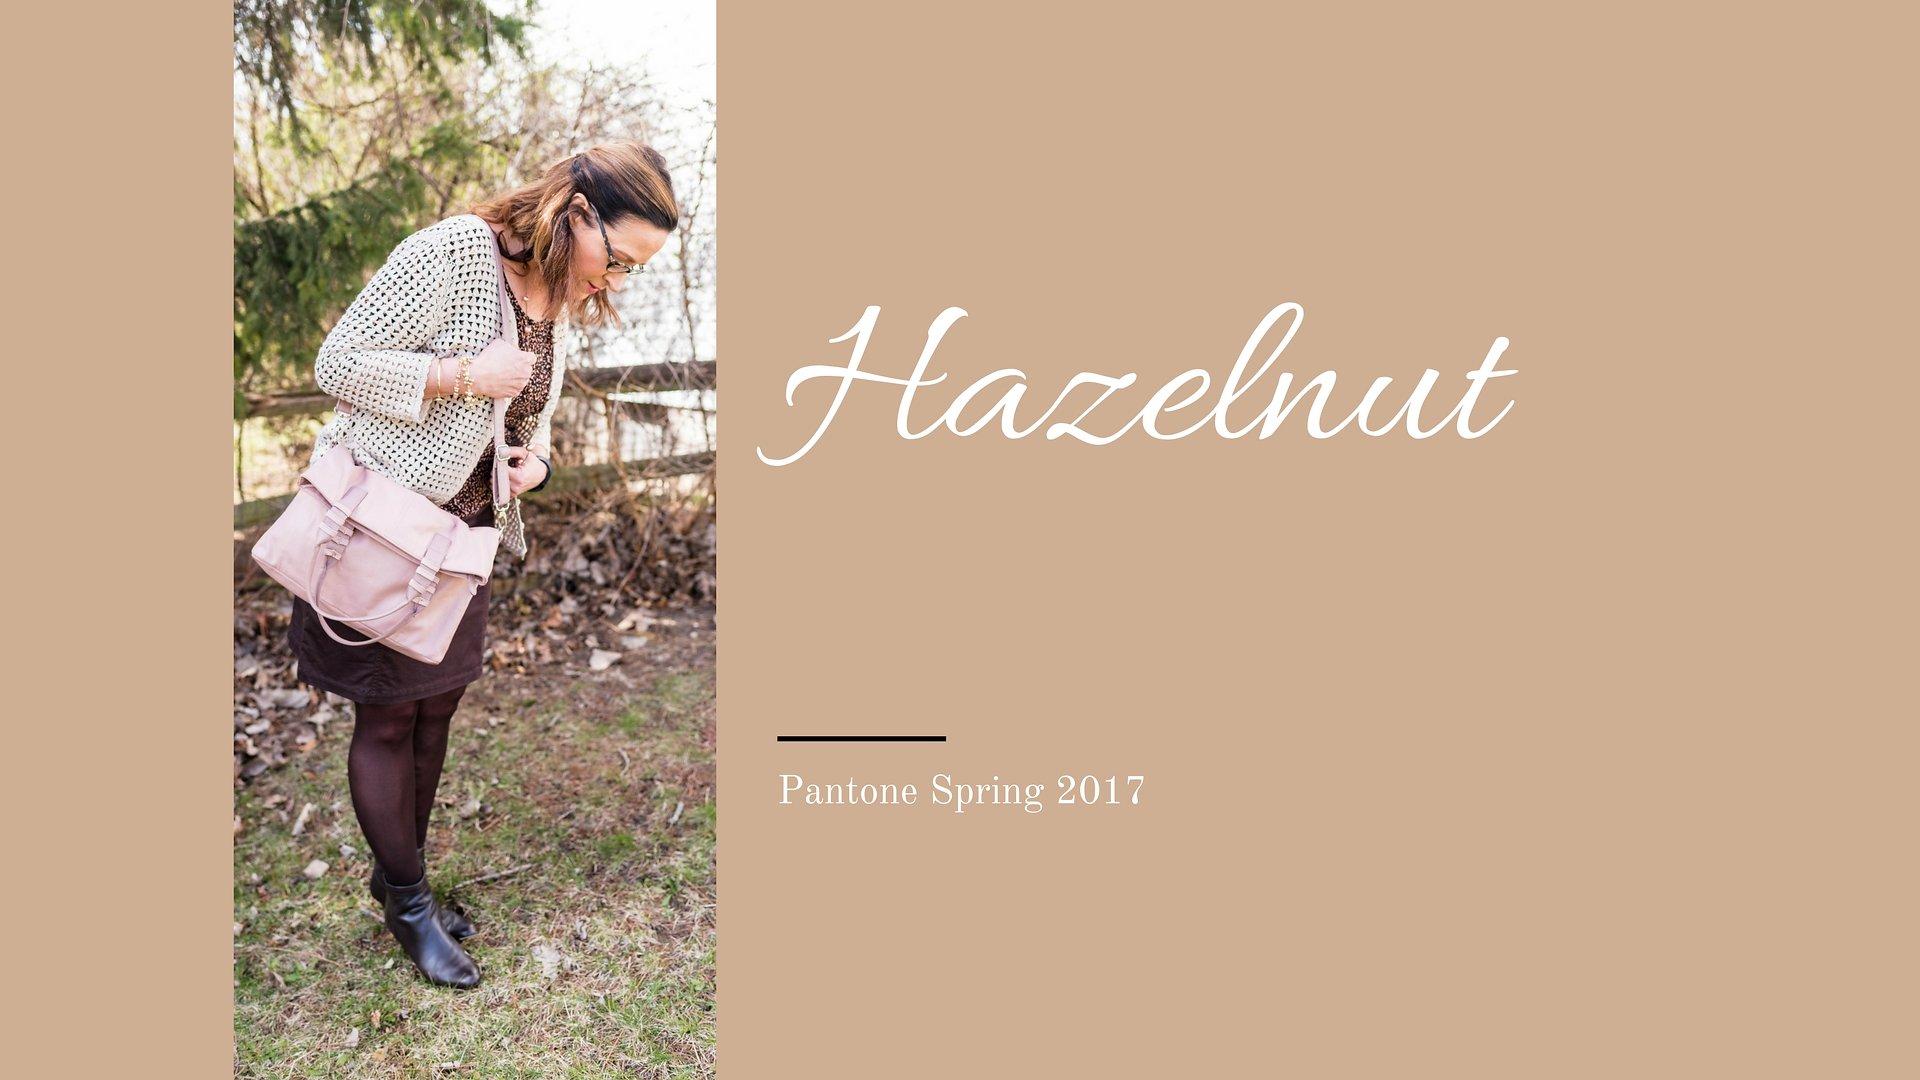 Pantone Spring 2017 - Hazelnut